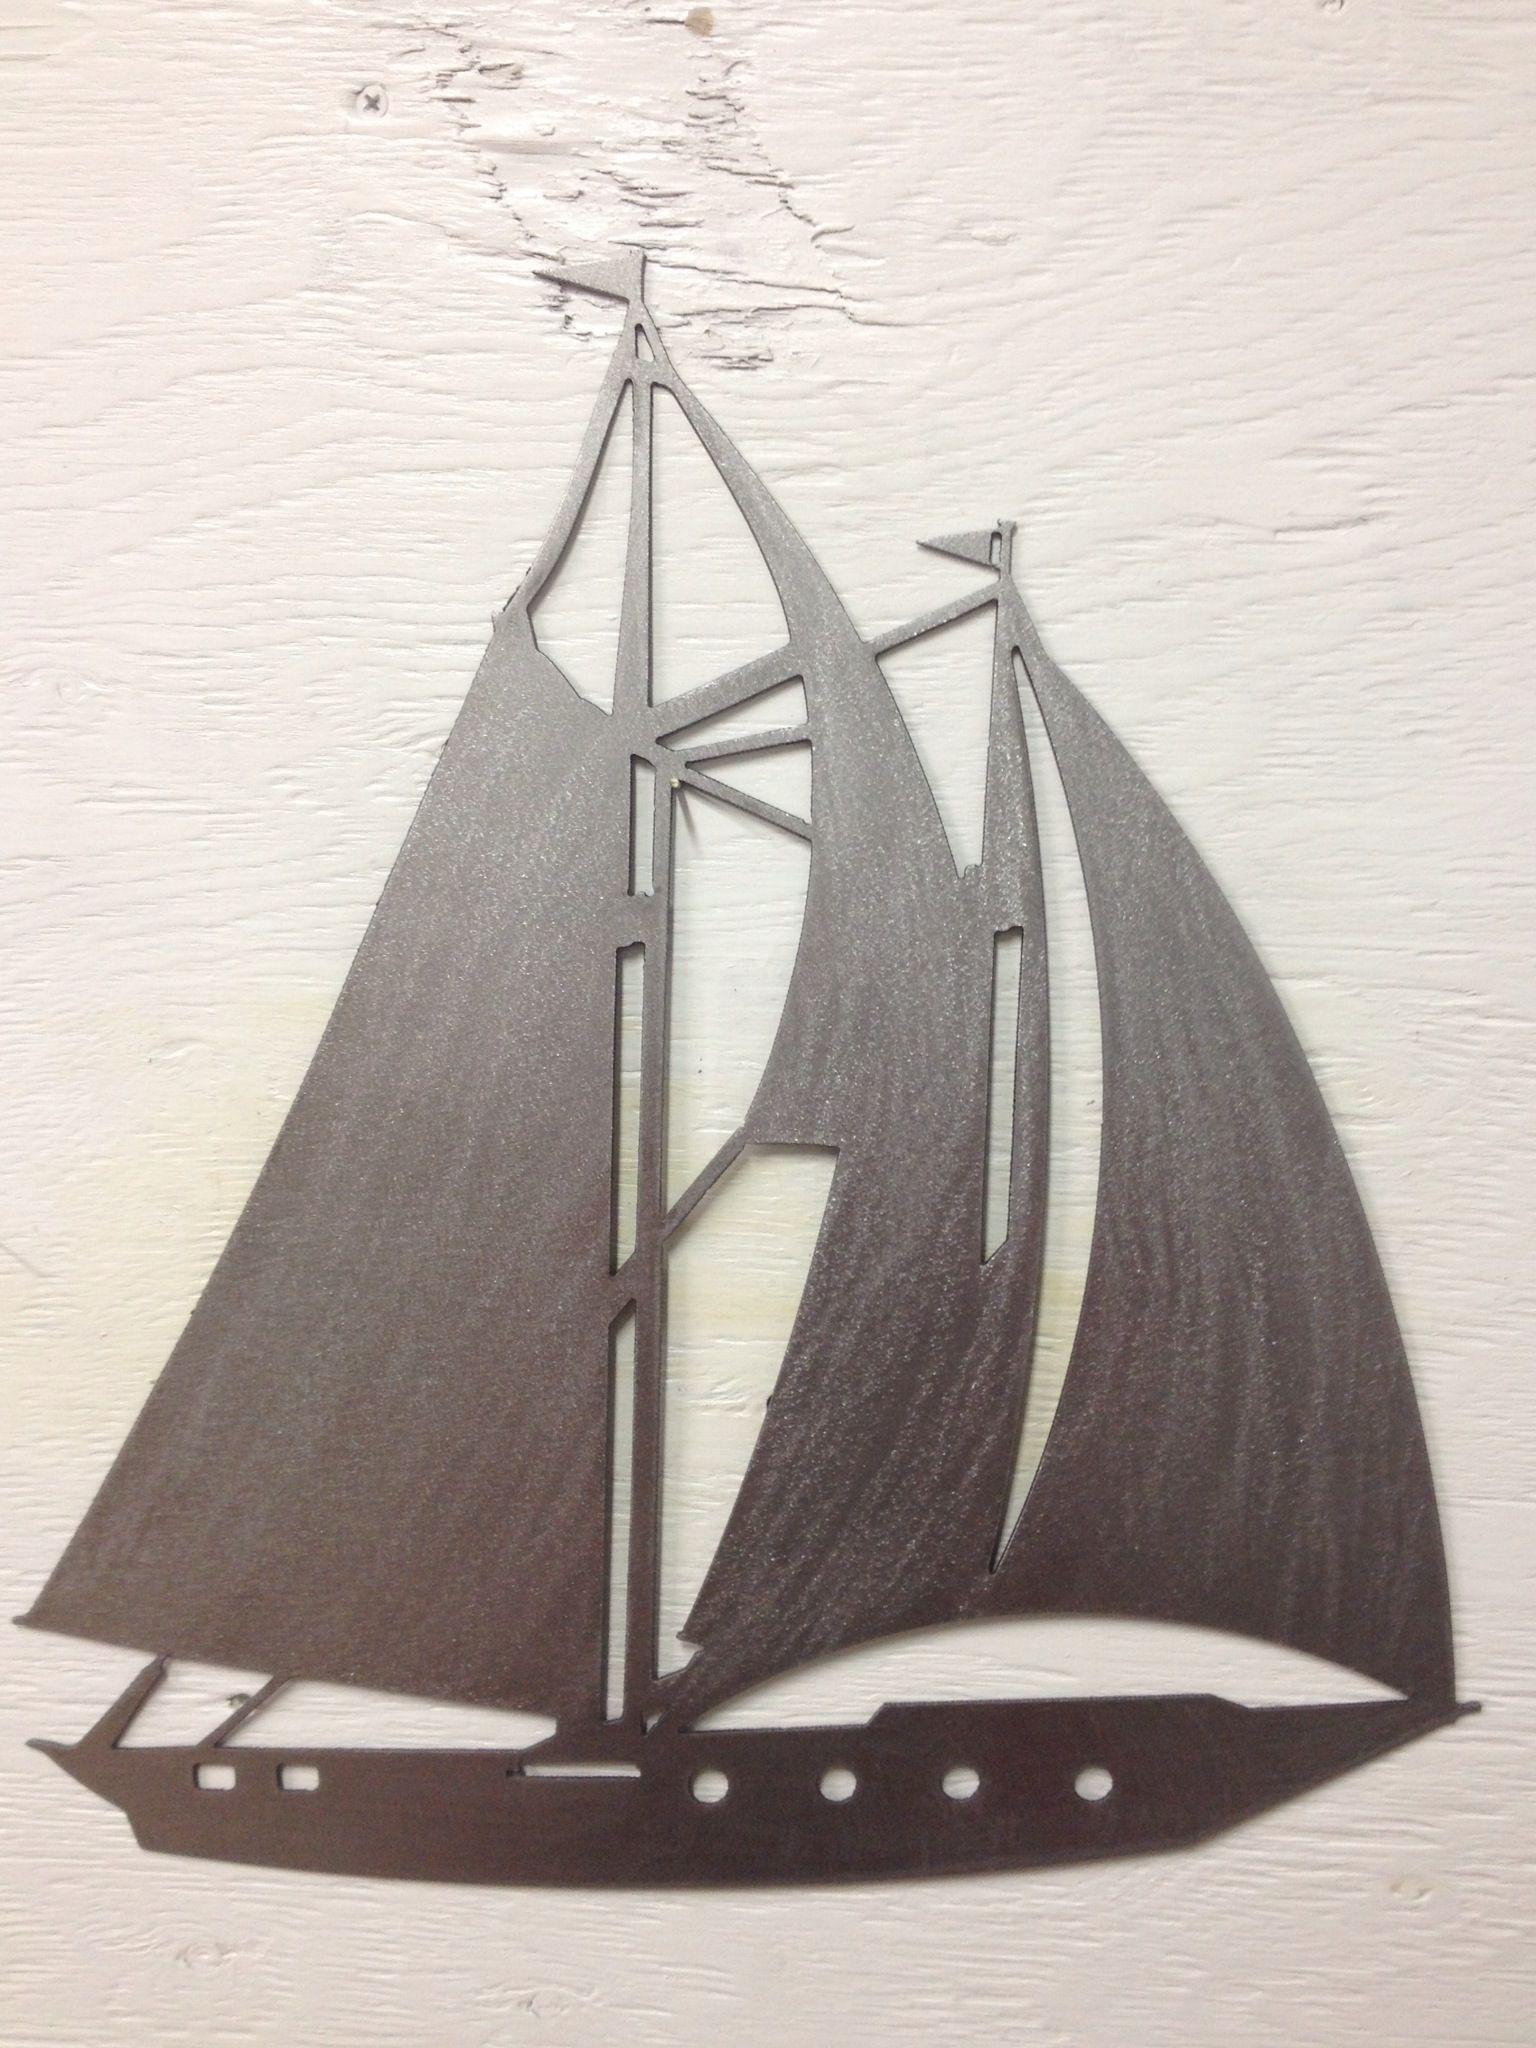 Pin On Ships And Boats